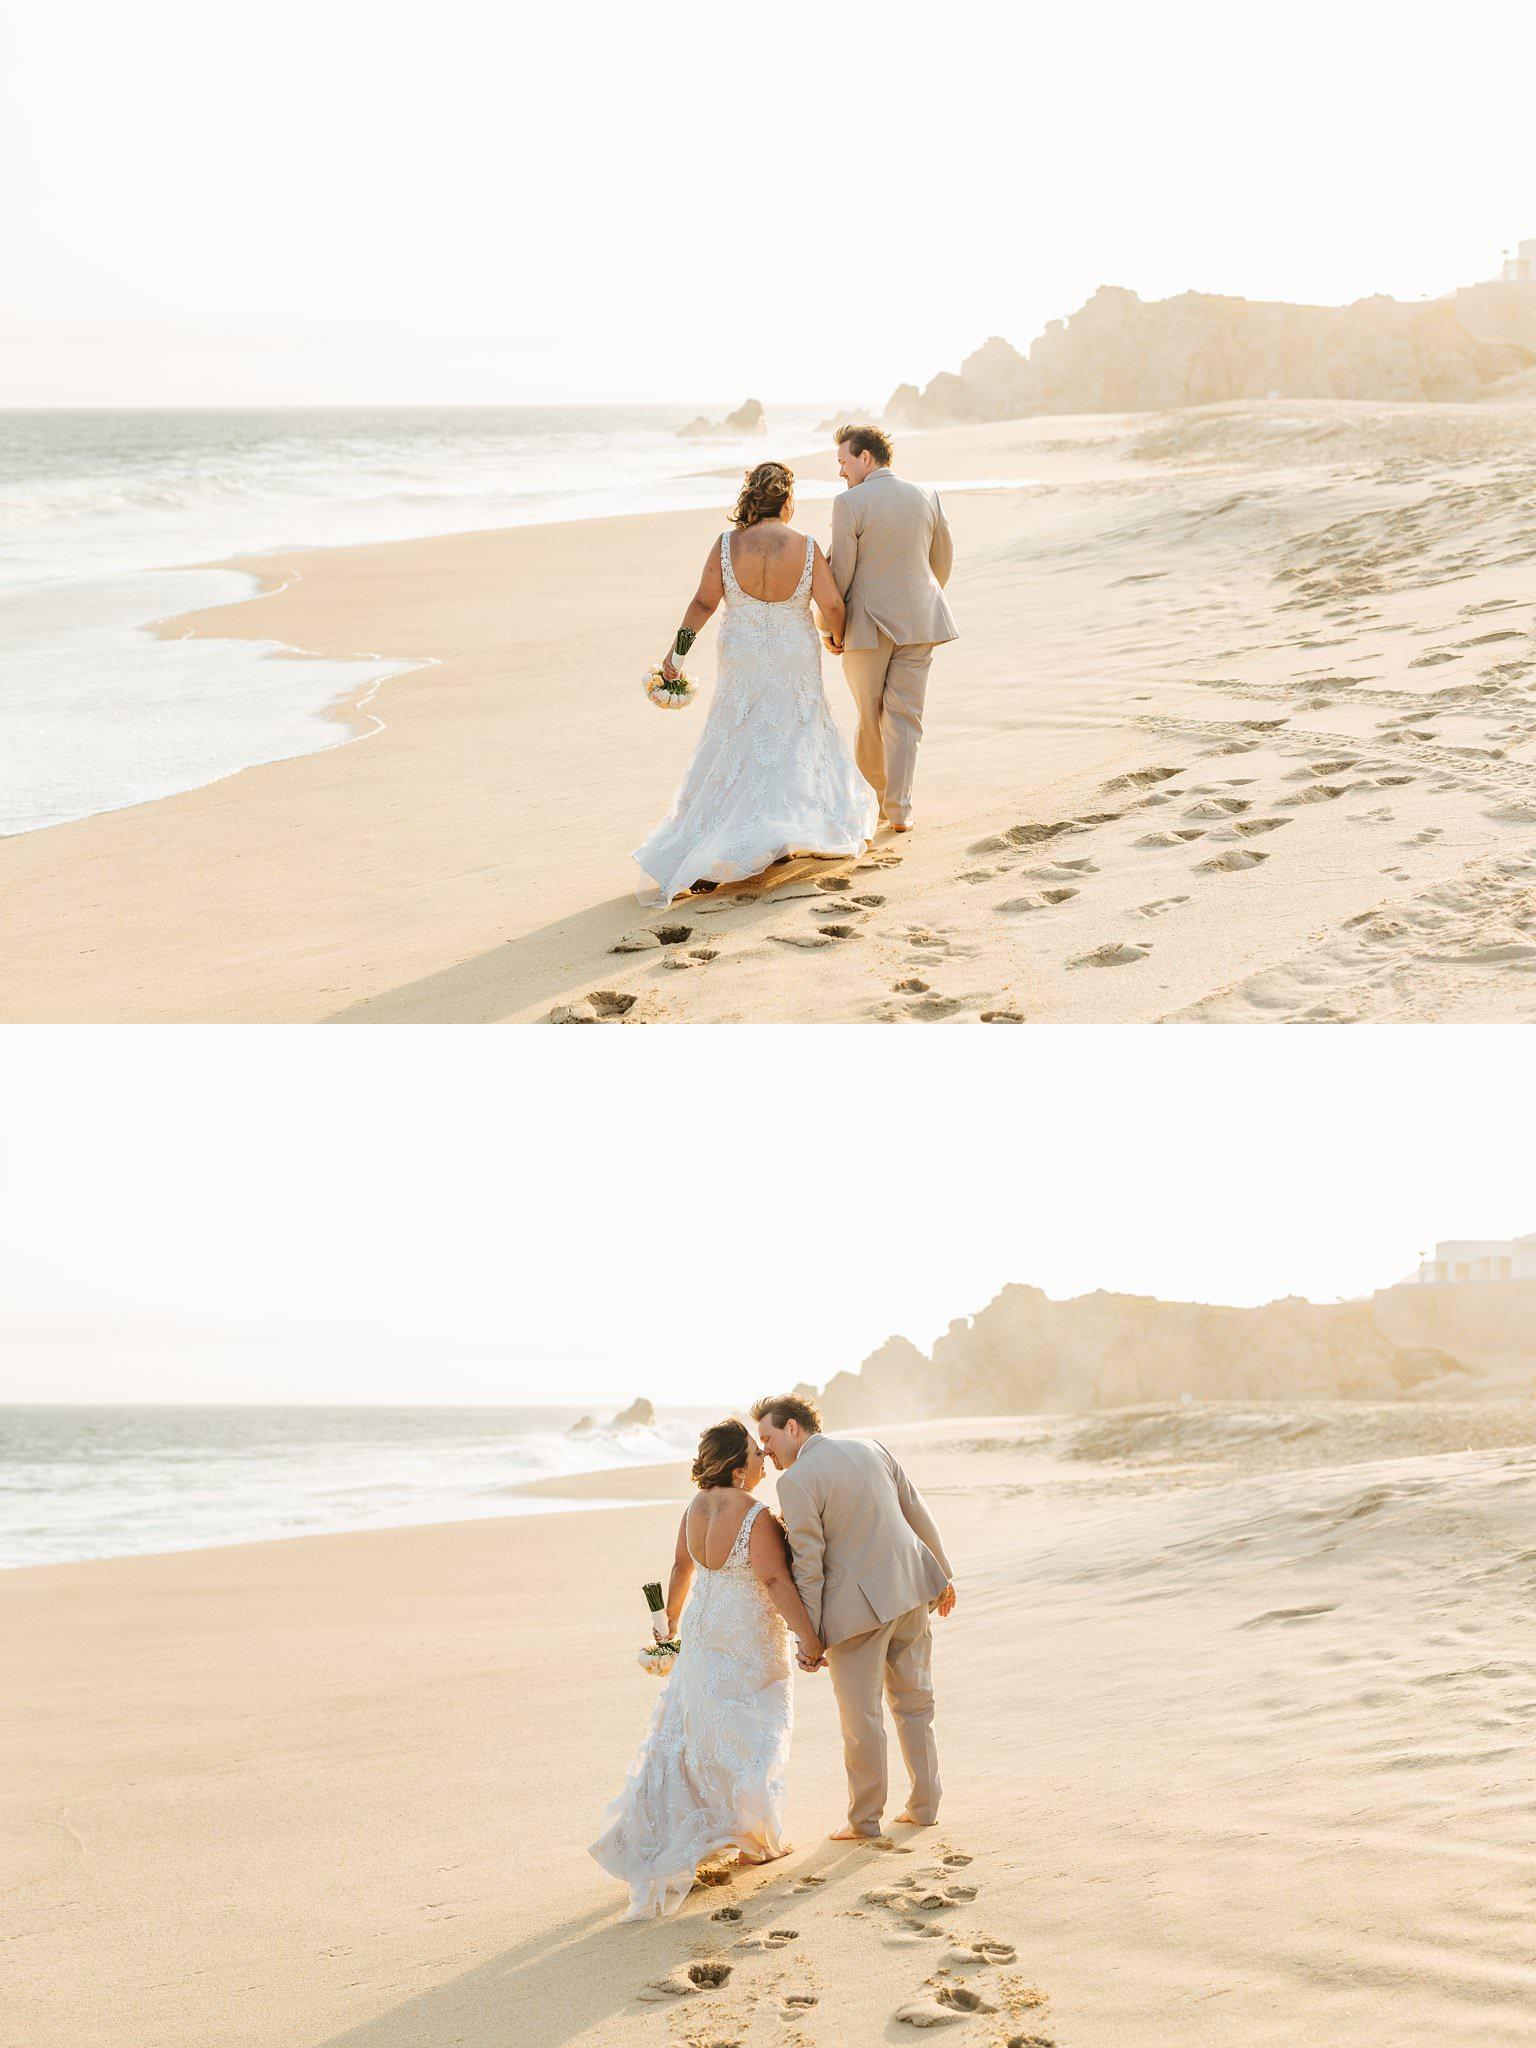 Destination beach wedding in Cabo San Lucas - http:///brittneyhannonphotography.com